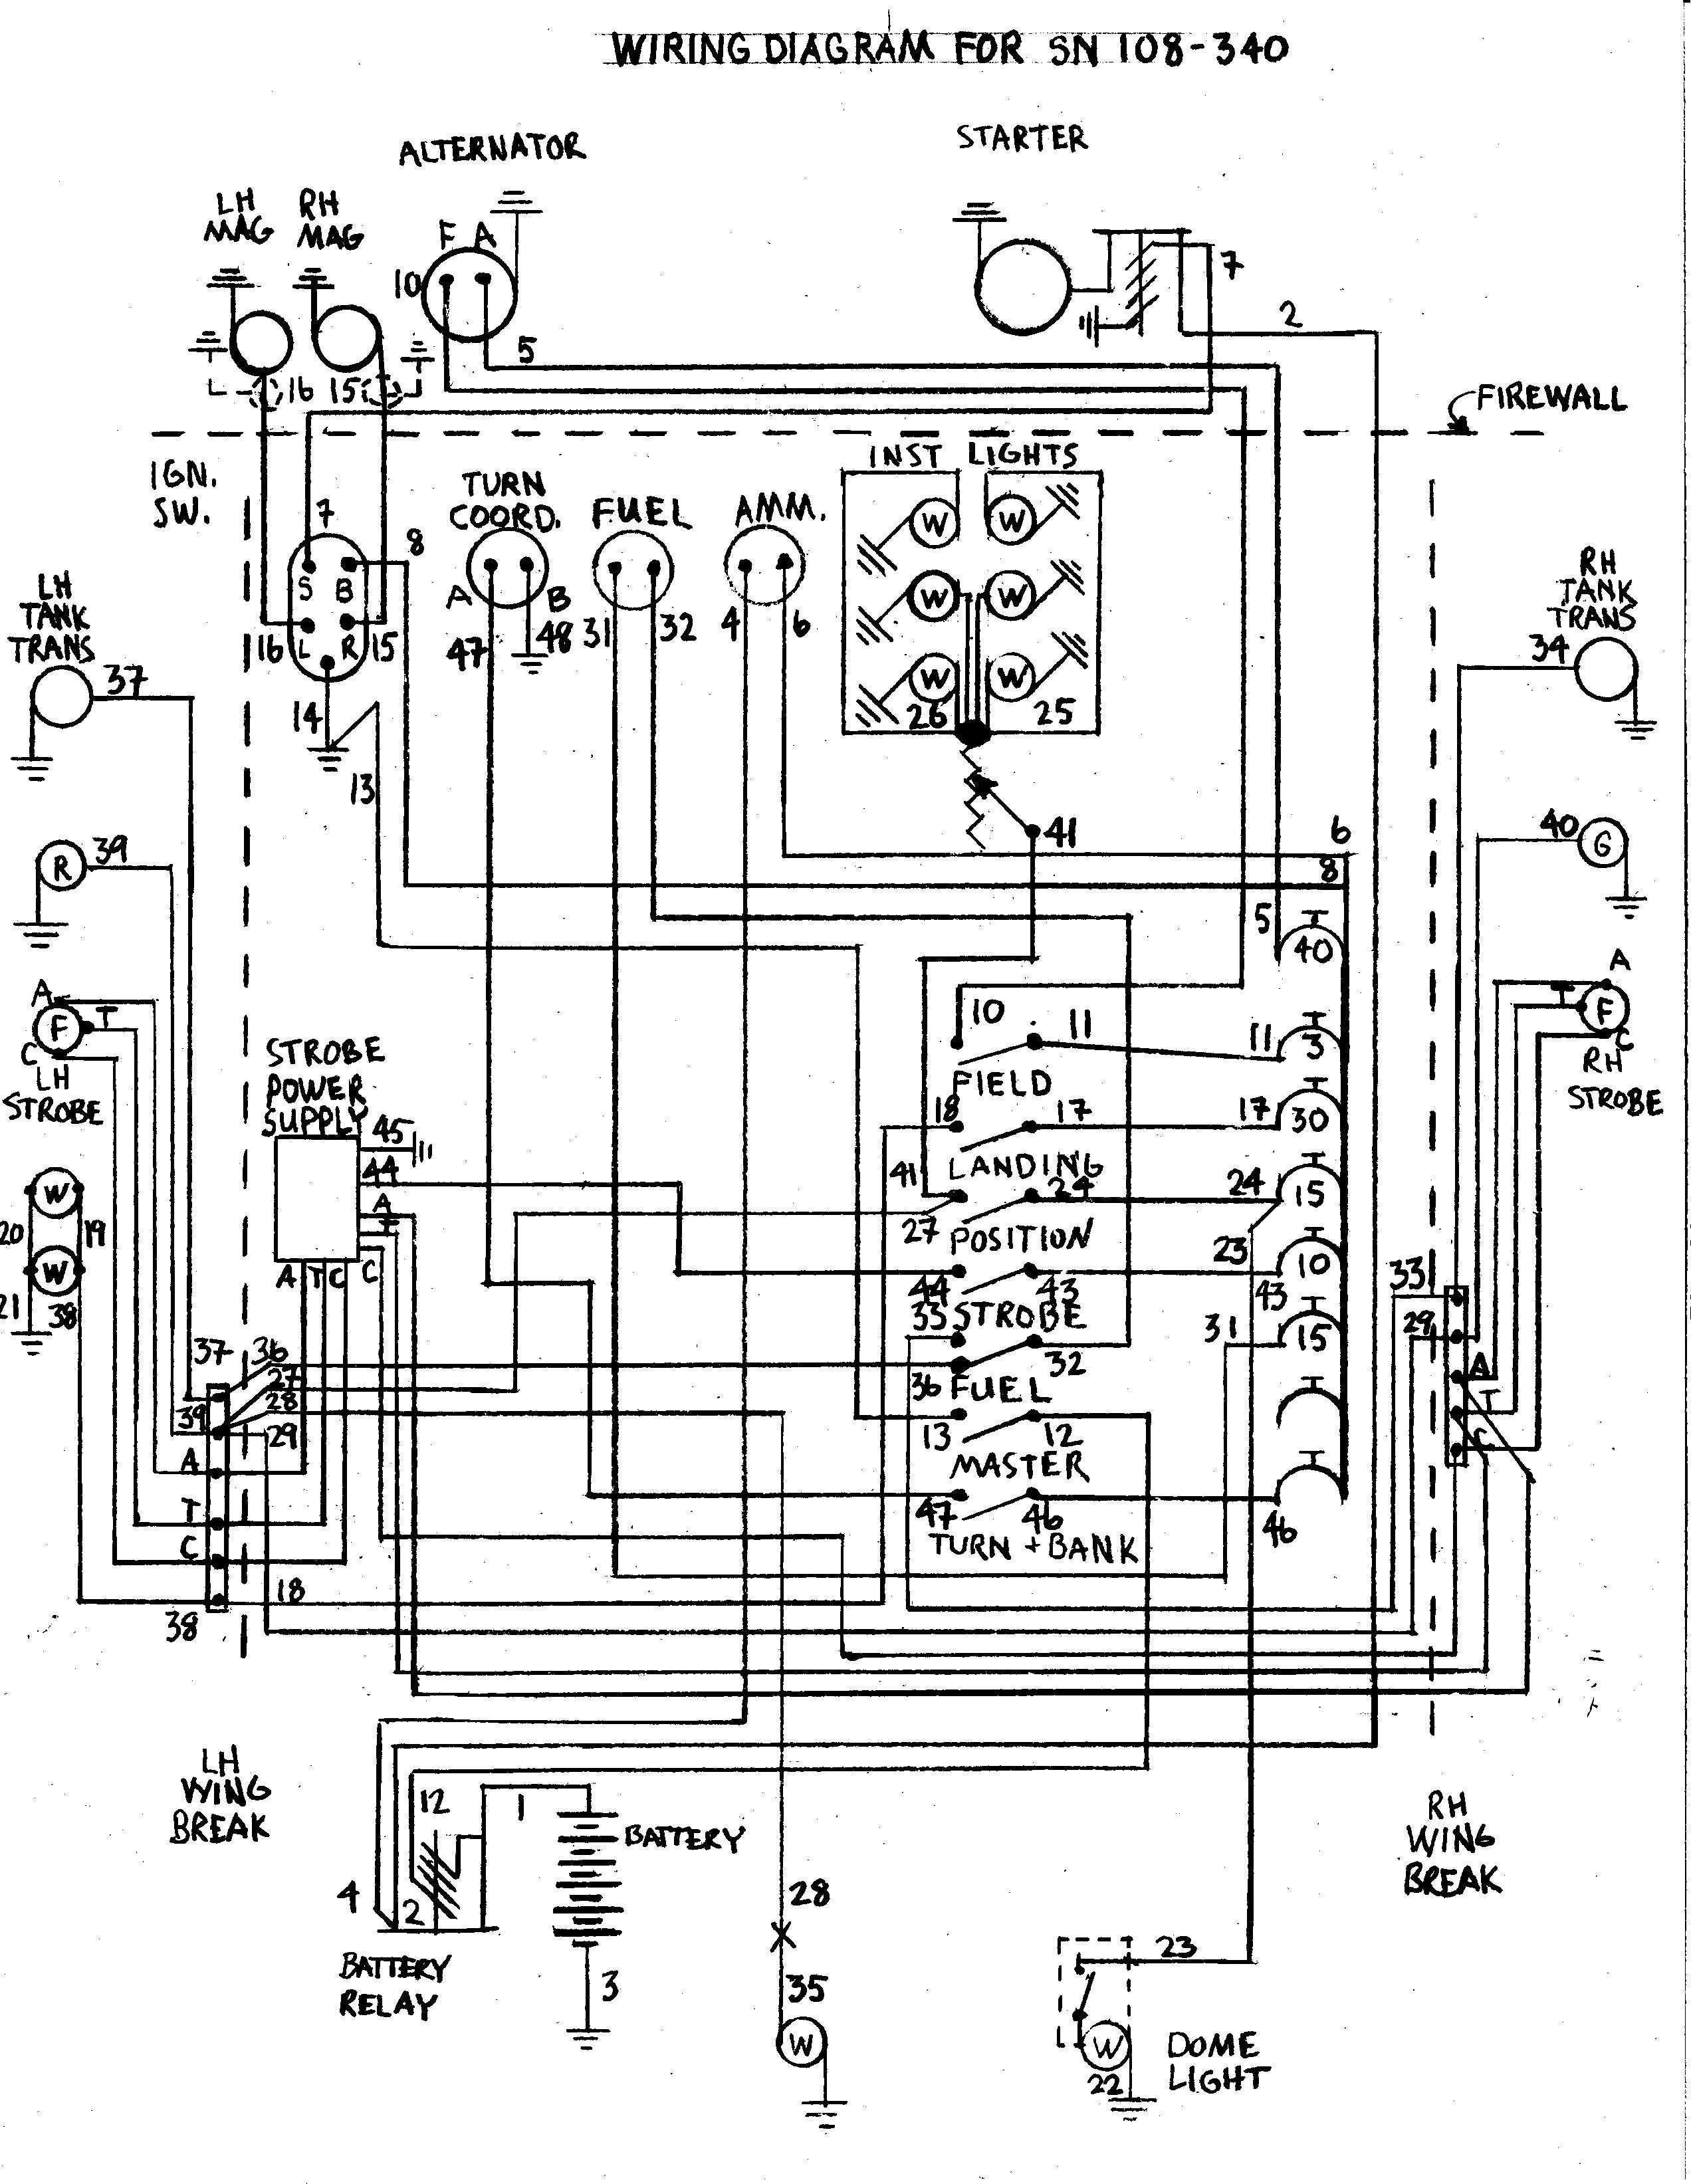 Bobcat 753 Kopplingsschema Manuell Spara 15 0 Pa Bobcat 753 Kopplingsdiagram Diagram Electrical Wiring Diagram House Wiring